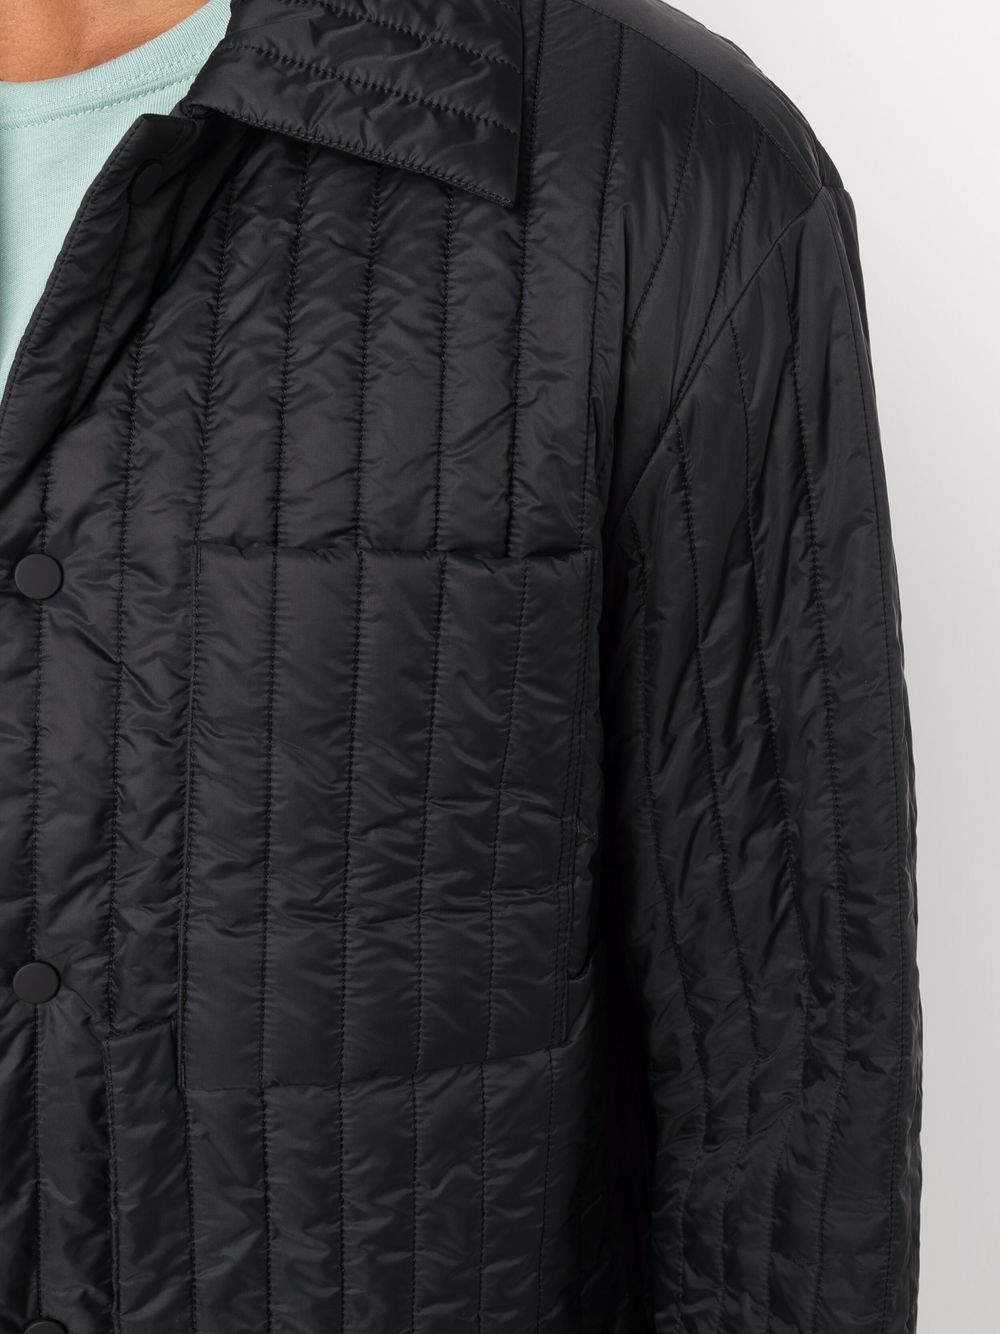 giacca camicia worker uomo nera in cotone CRAIG GREEN | Giacche | CGAW21CWOJKT01